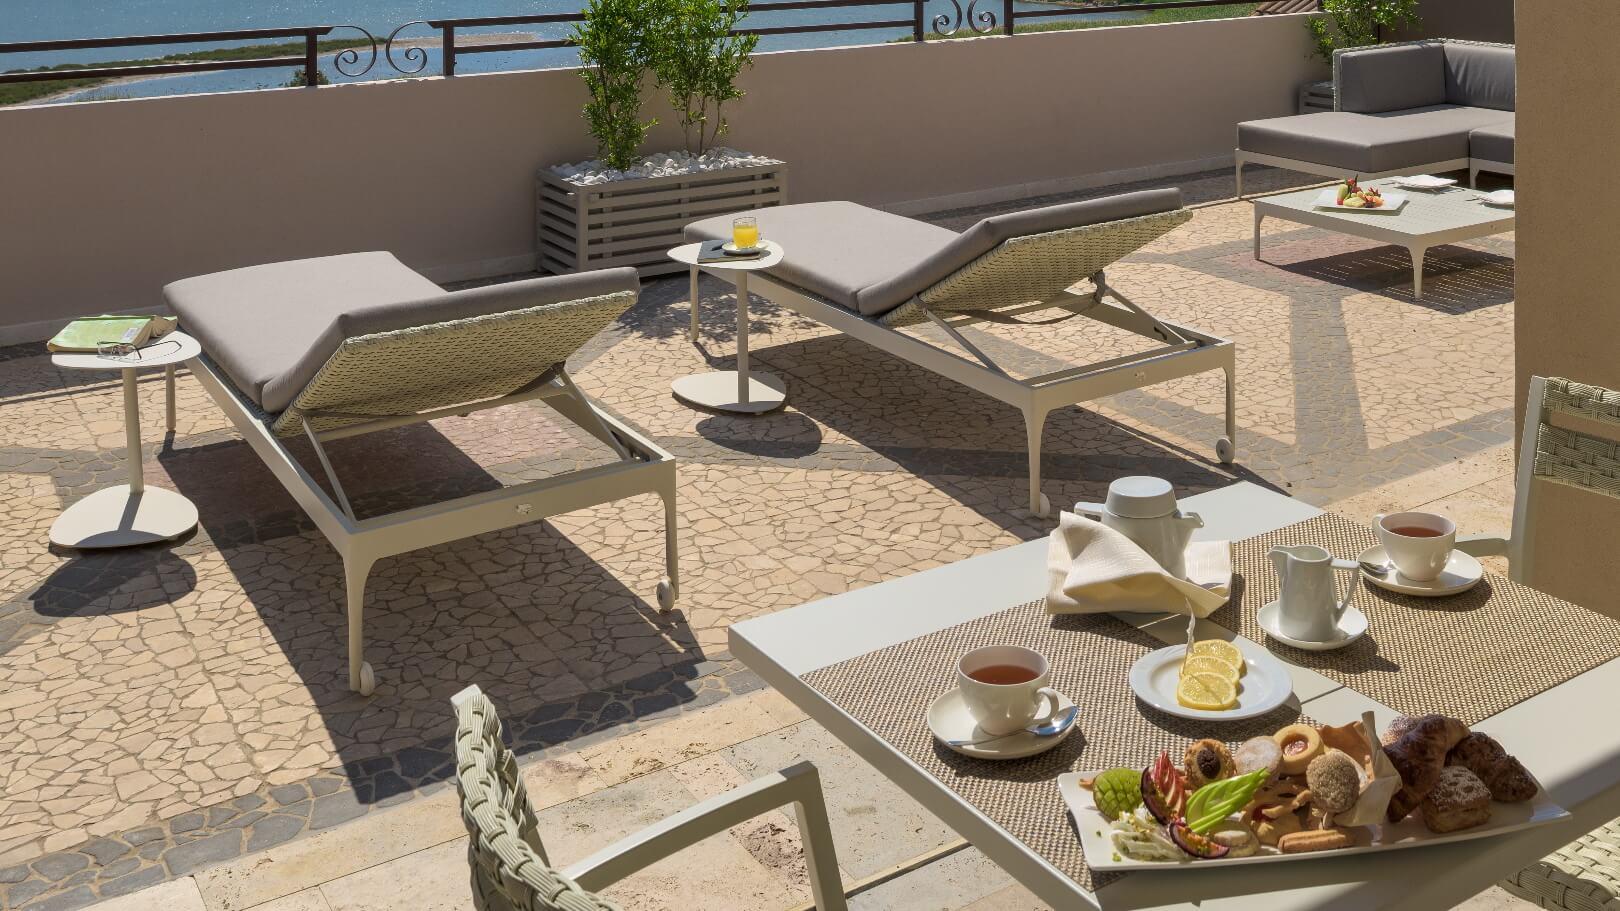 https://www.chialagunaresort.com/wp-content/uploads/2021/05/IHC_Chia-Laguna-Resort_grid_CL4U_breakfast.jpg